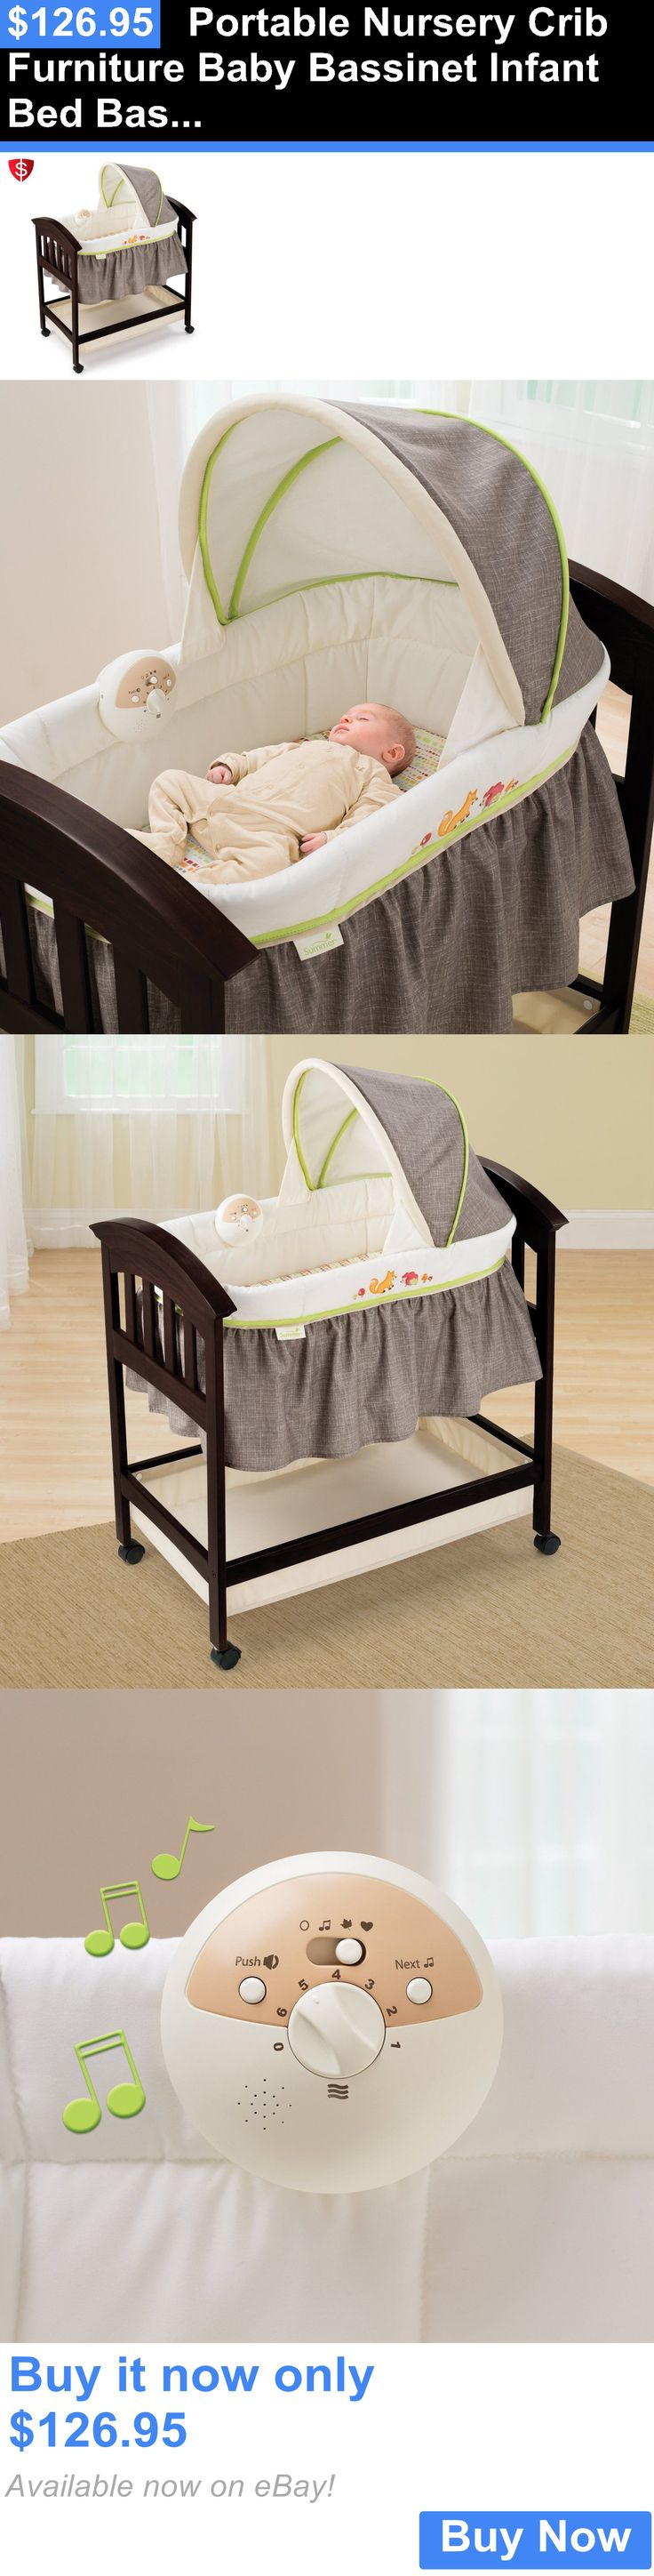 Special enclosed crib for premature babies - Baby Nursery Portable Nursery Crib Furniture Baby Bassinet Infant Bed Basket Wood Cradle Buy It